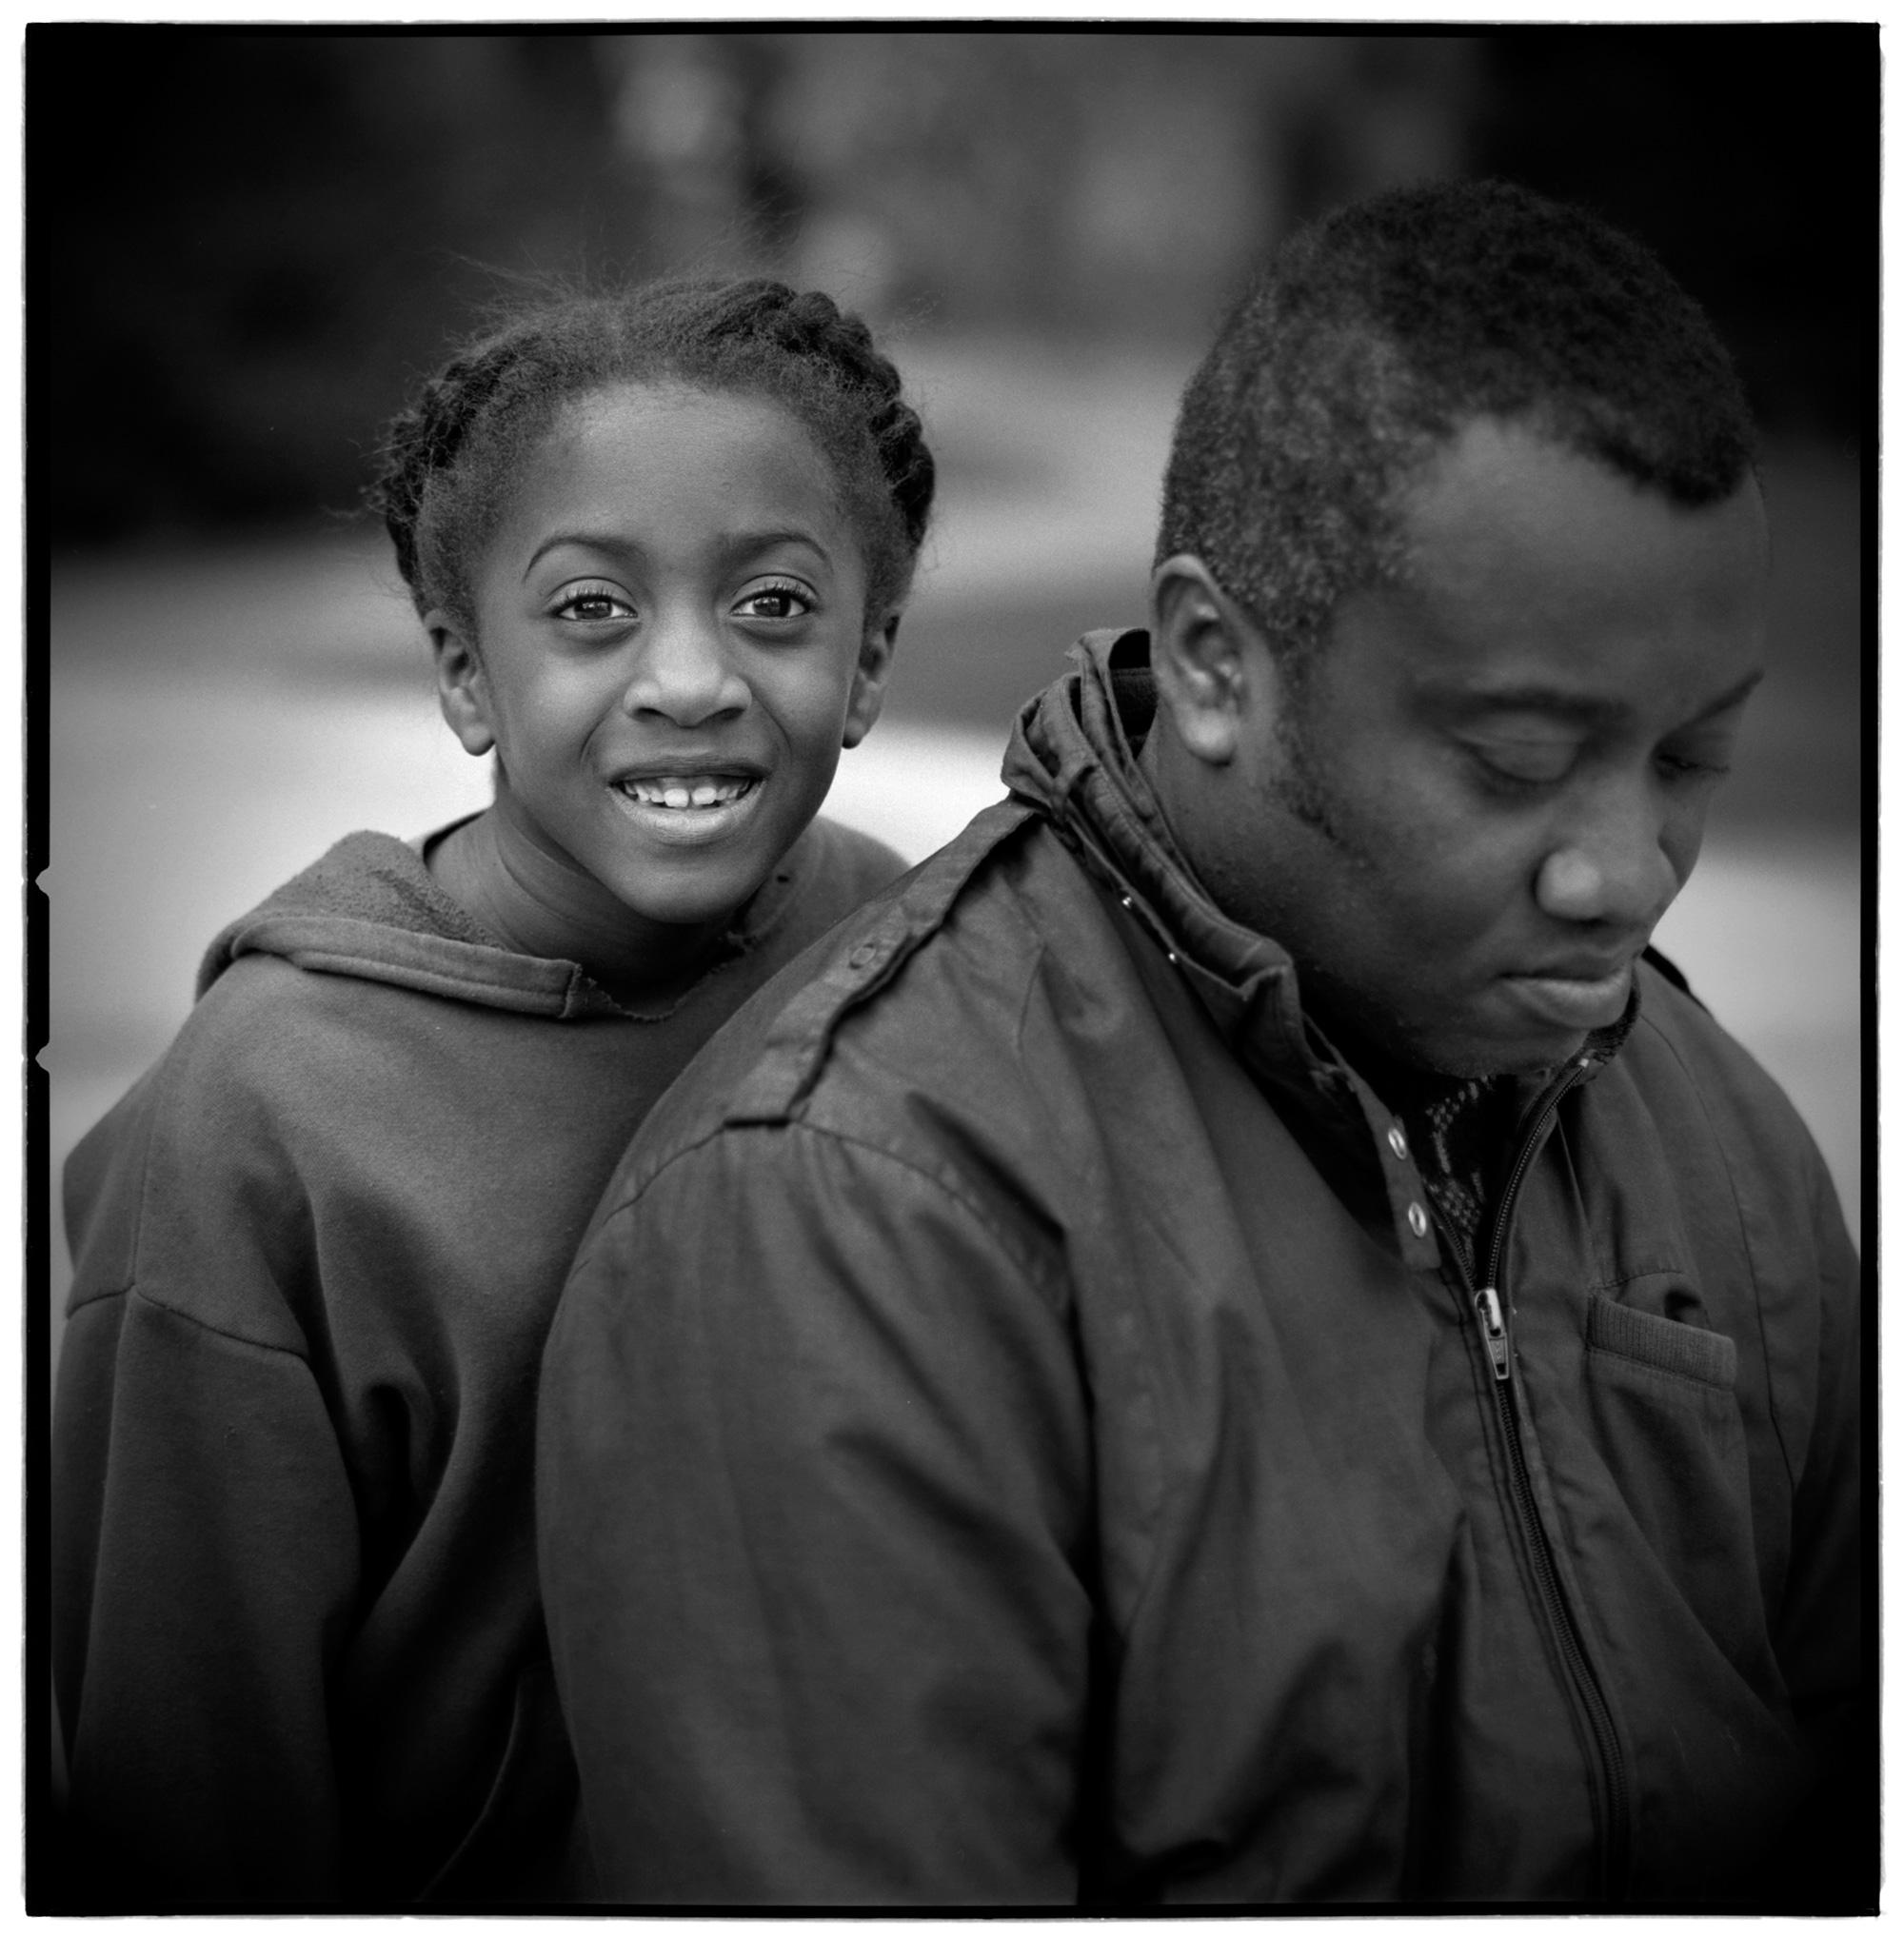 Fatheranddaughter2-8b.jpg